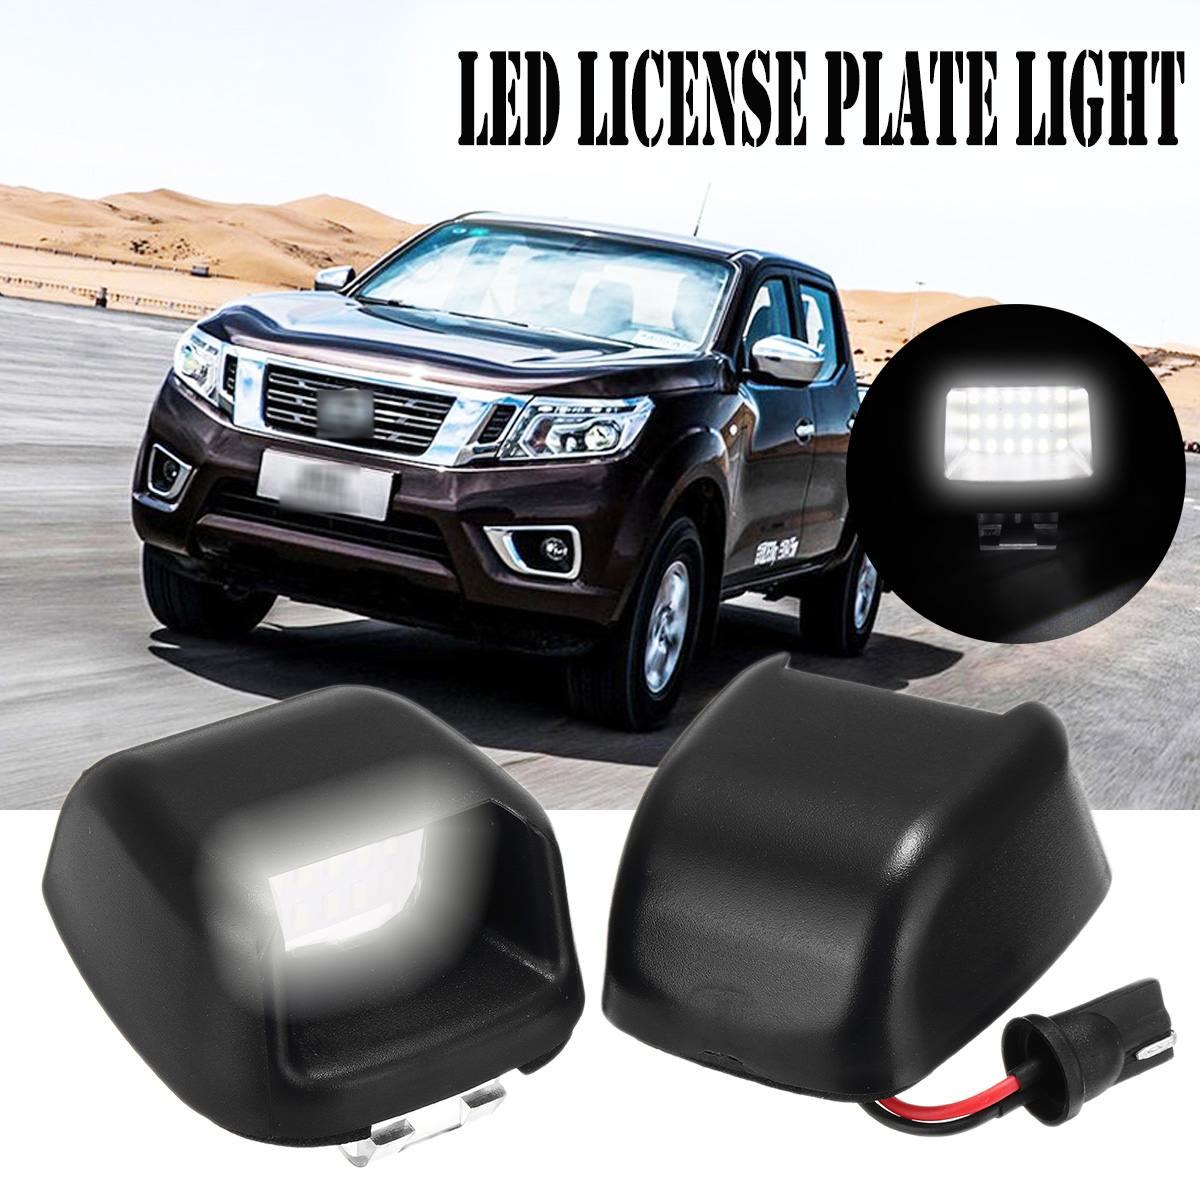 2pcs Error Free Led Number Plate Bulbs White 18 Led License Plate Light Lamp For For Nissan Navara D40 04-18 For Suzuki Equator